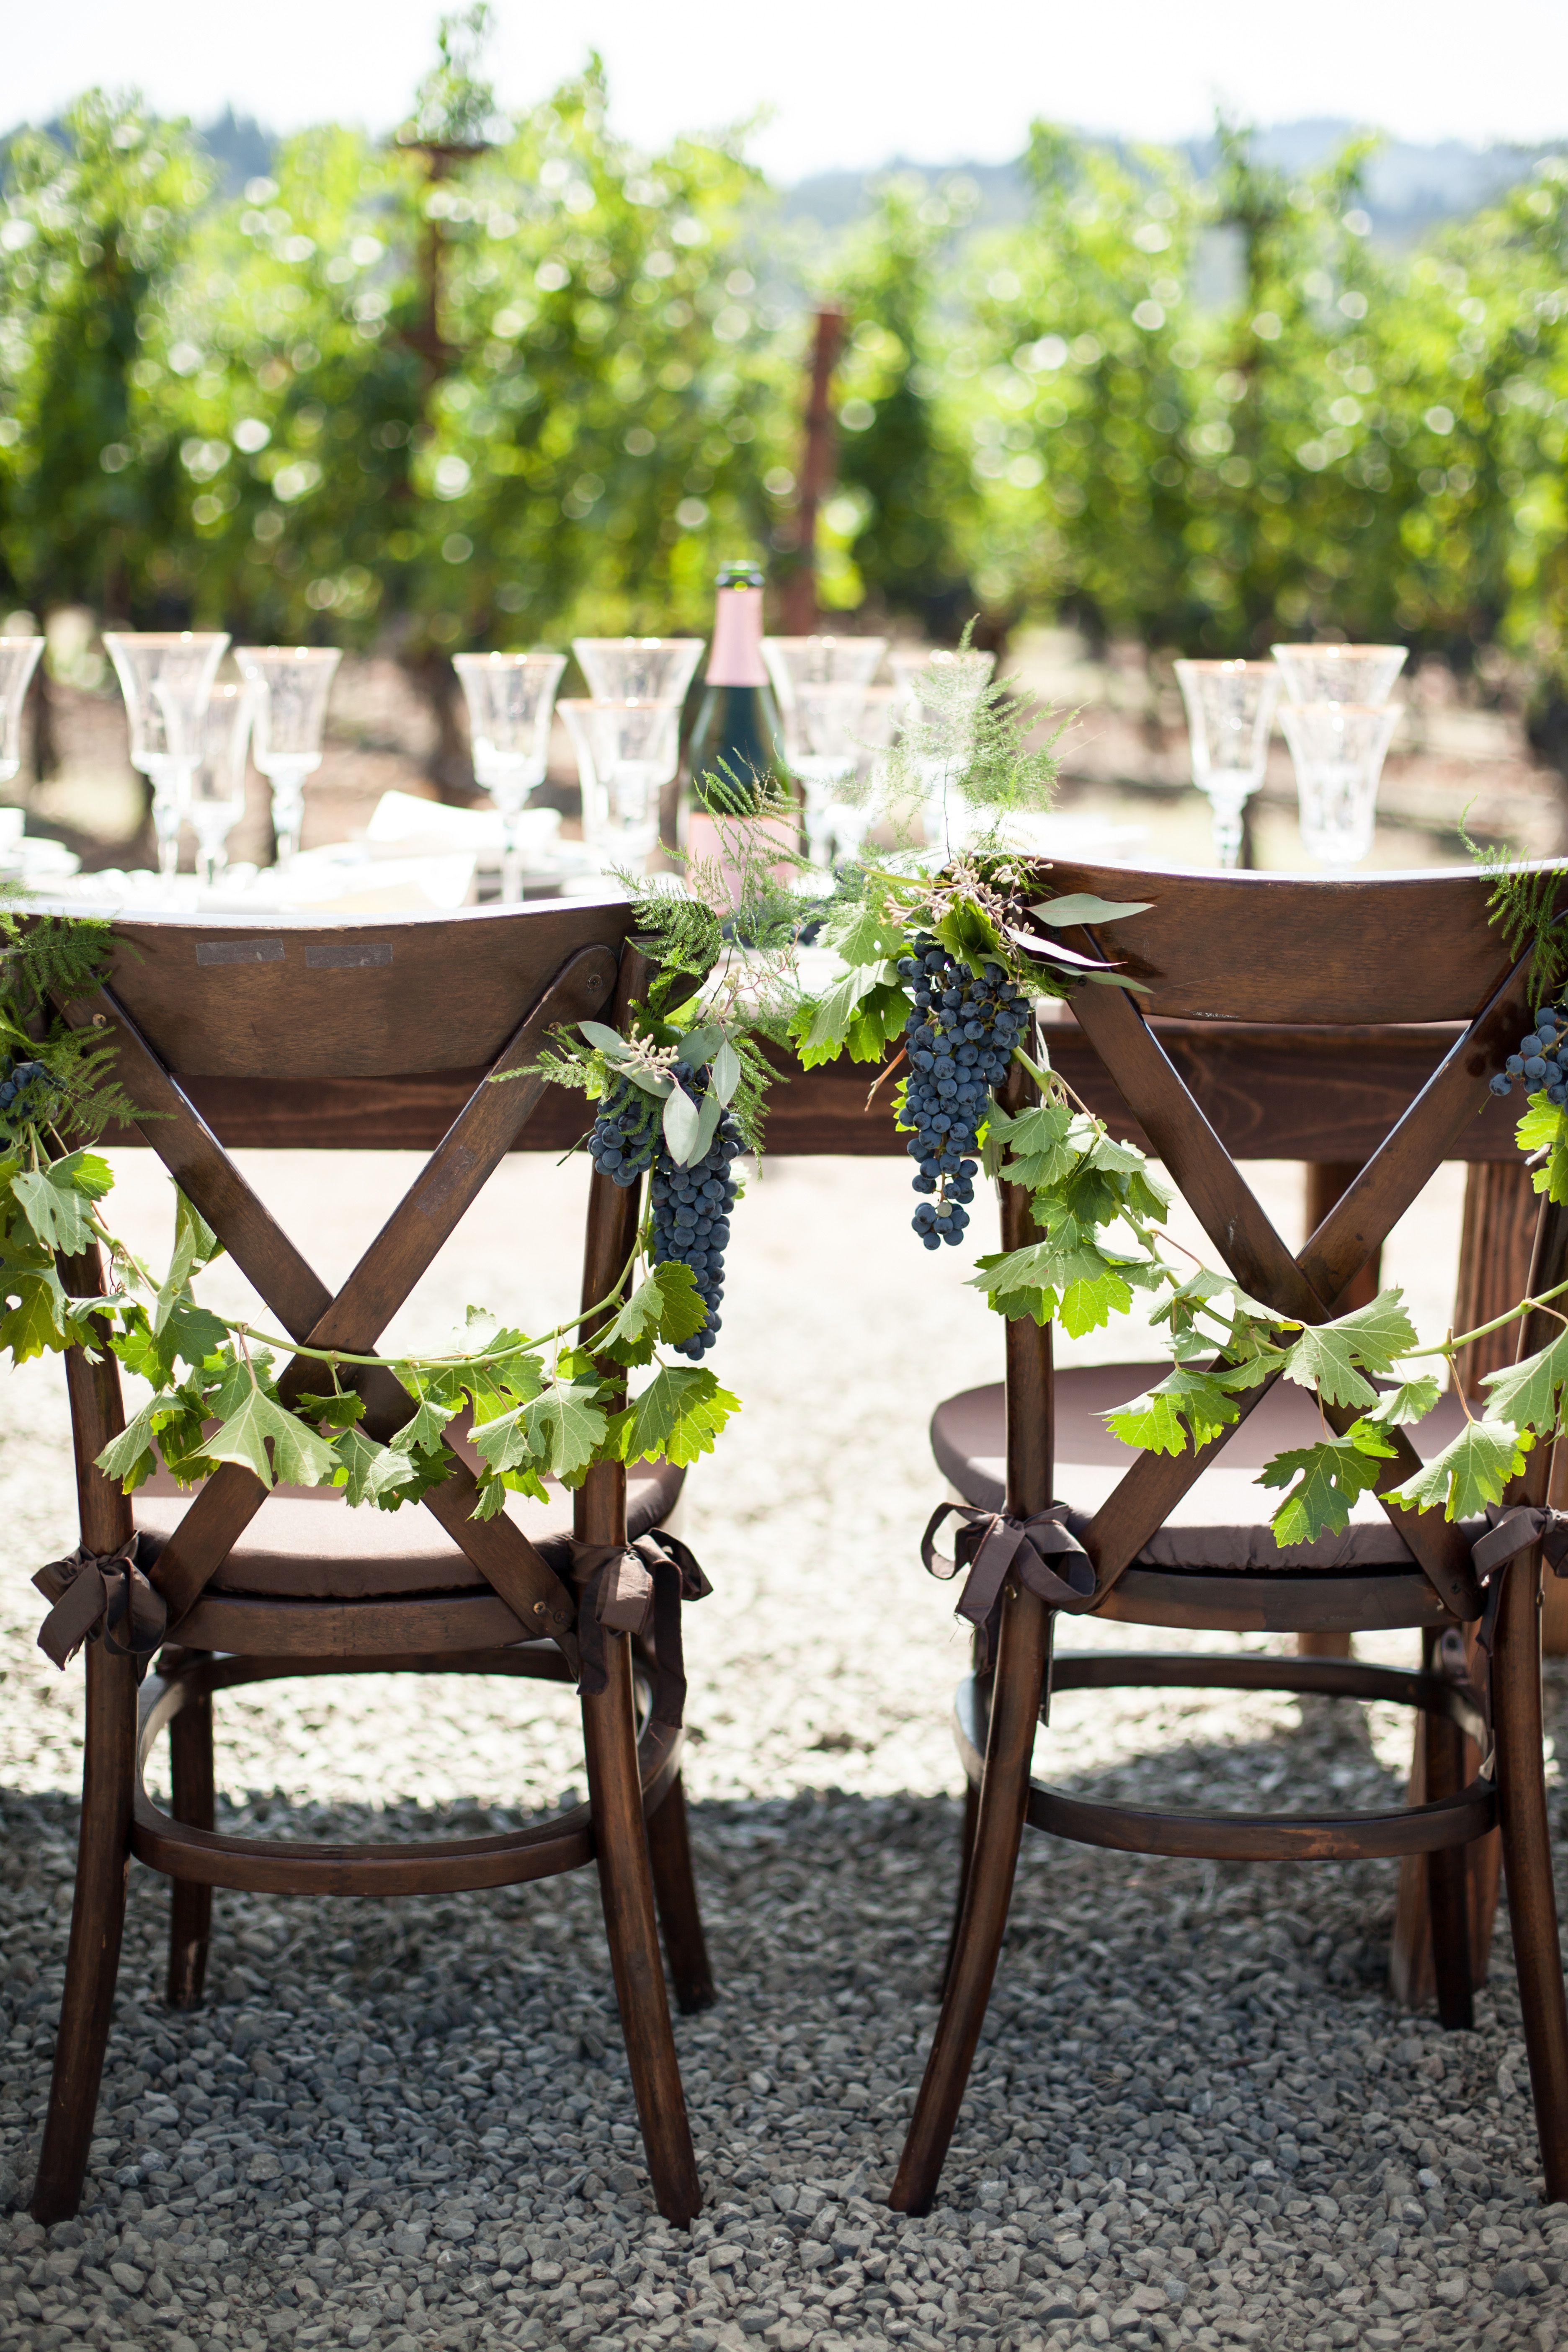 Vineyard Wedding Chair Decor Photo By Megan Clouse Vineyard